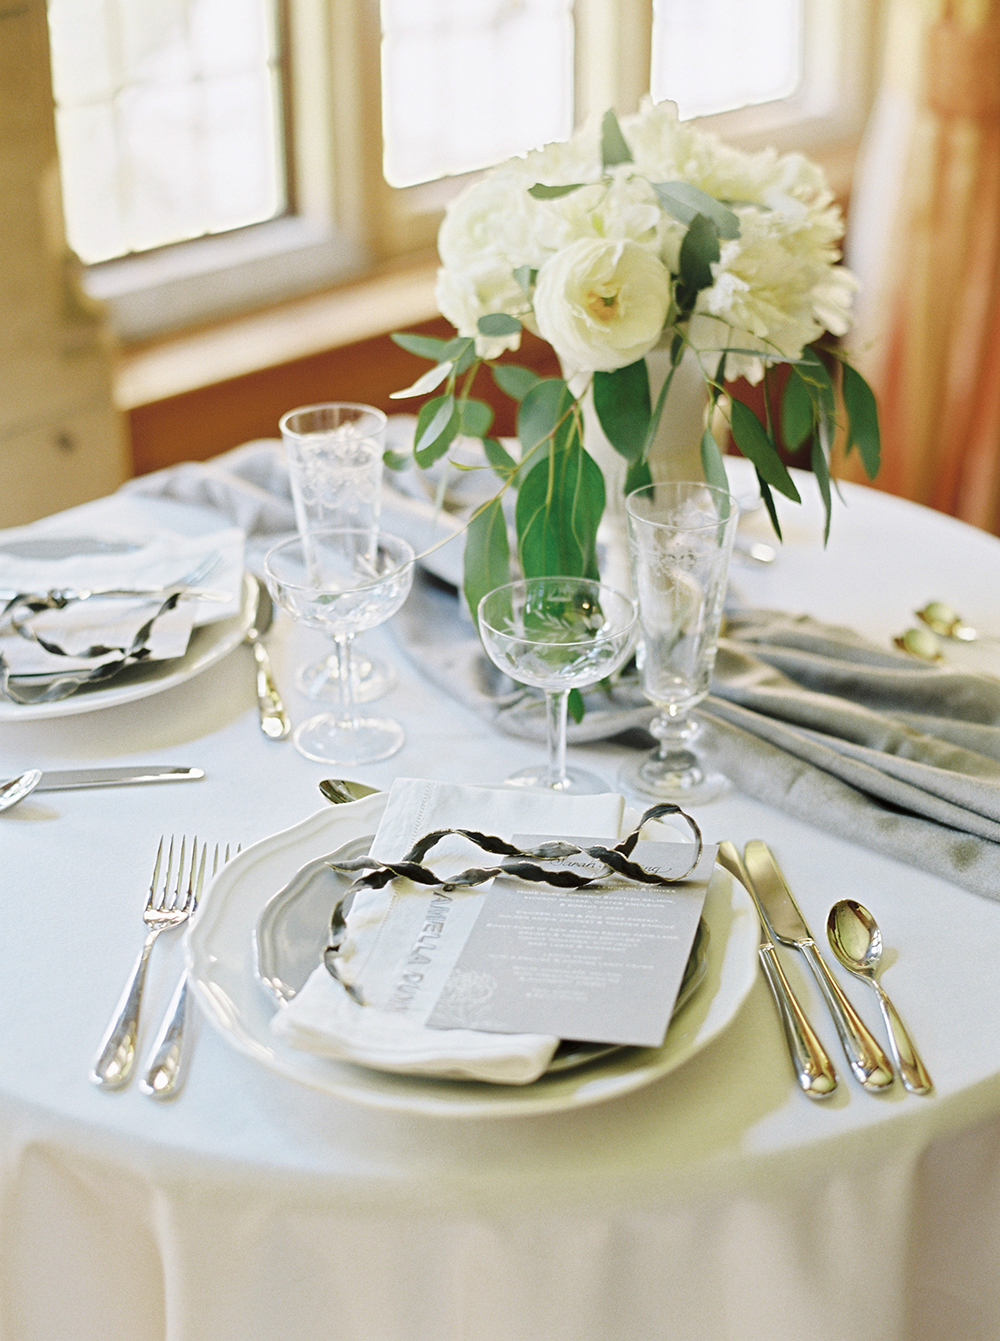 weddingstationery,weddingmenu,sweethearttable,peonycentrepiece,